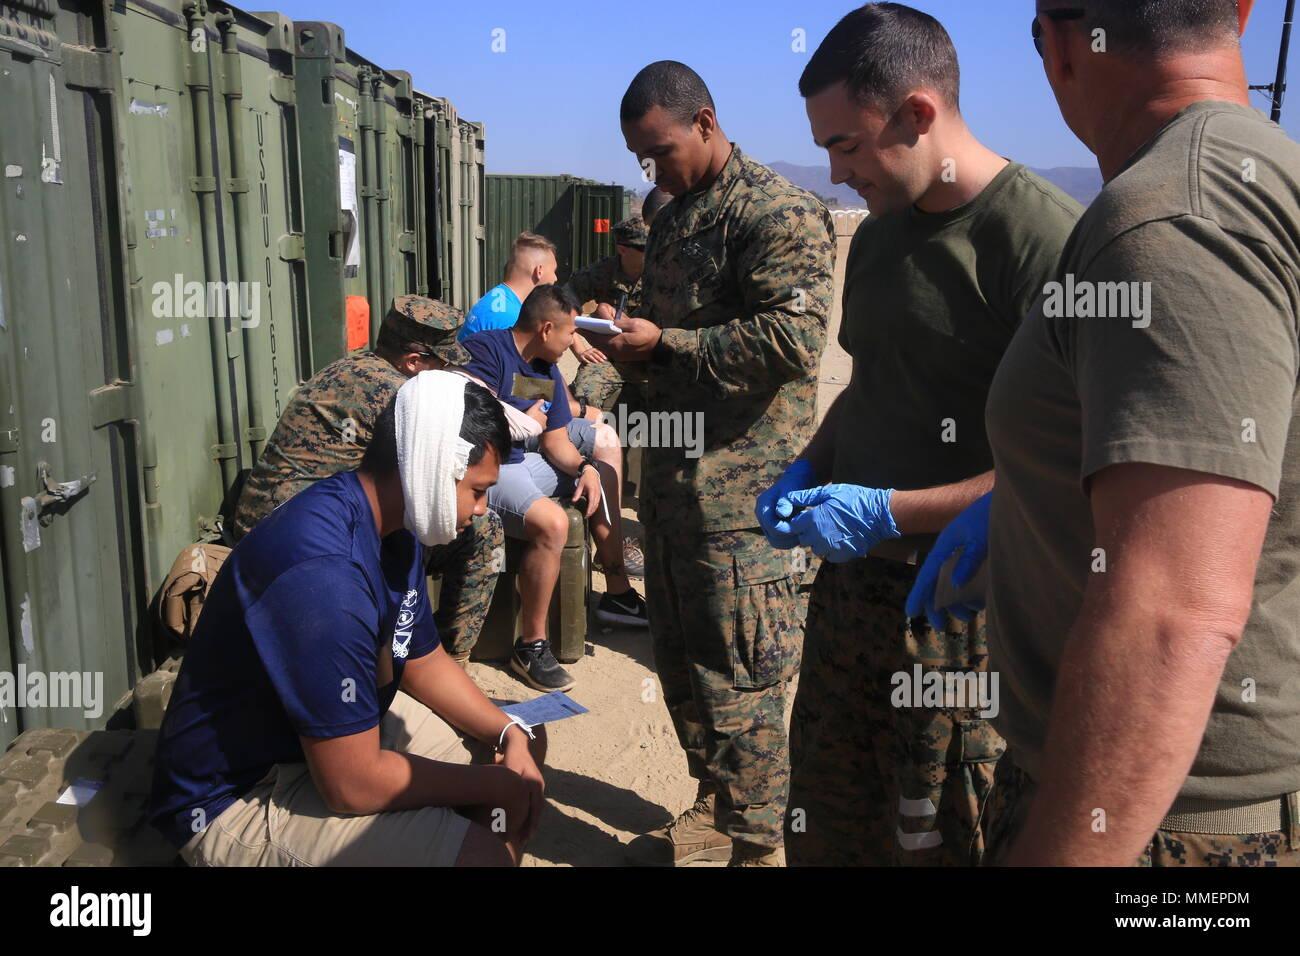 Medical evacuation of victims